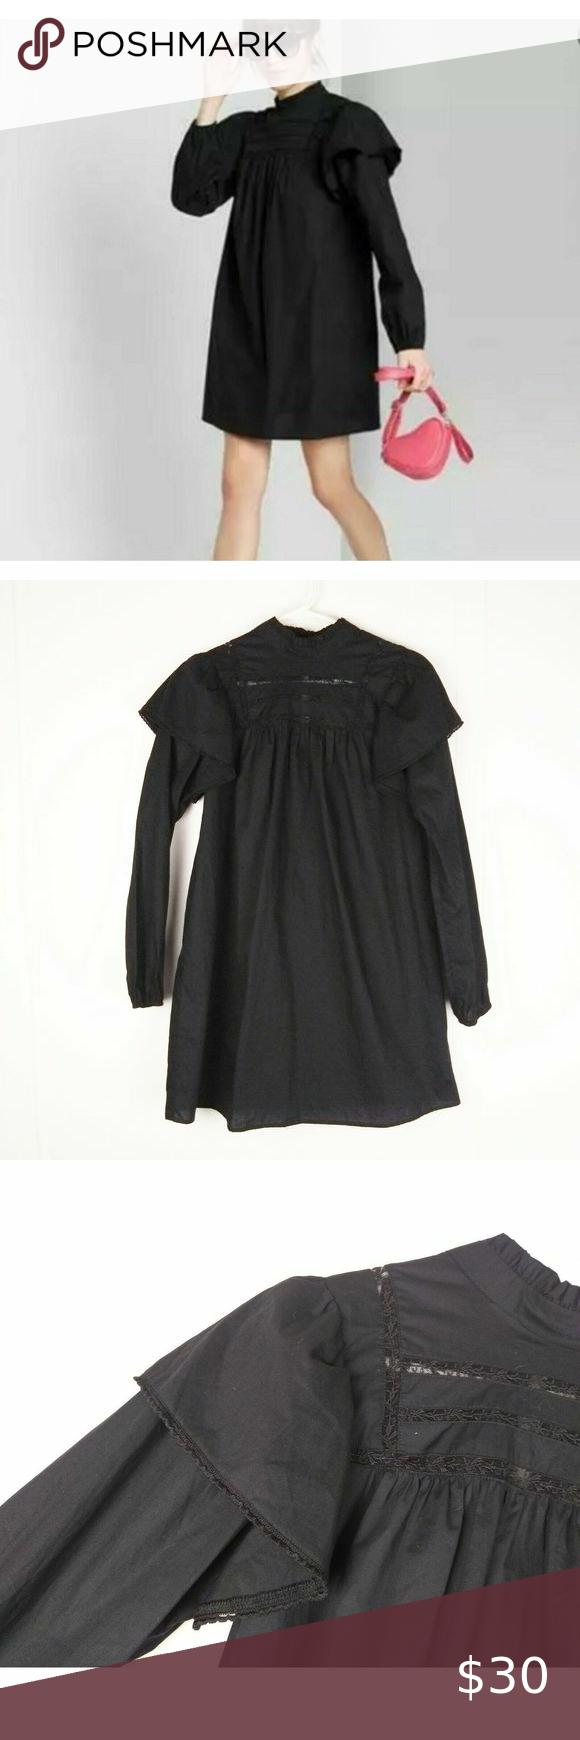 Wild Fable New Black Poplin Dress S Poplin Dress Black Poplin Dress Long Sleeve Dress [ 1740 x 580 Pixel ]